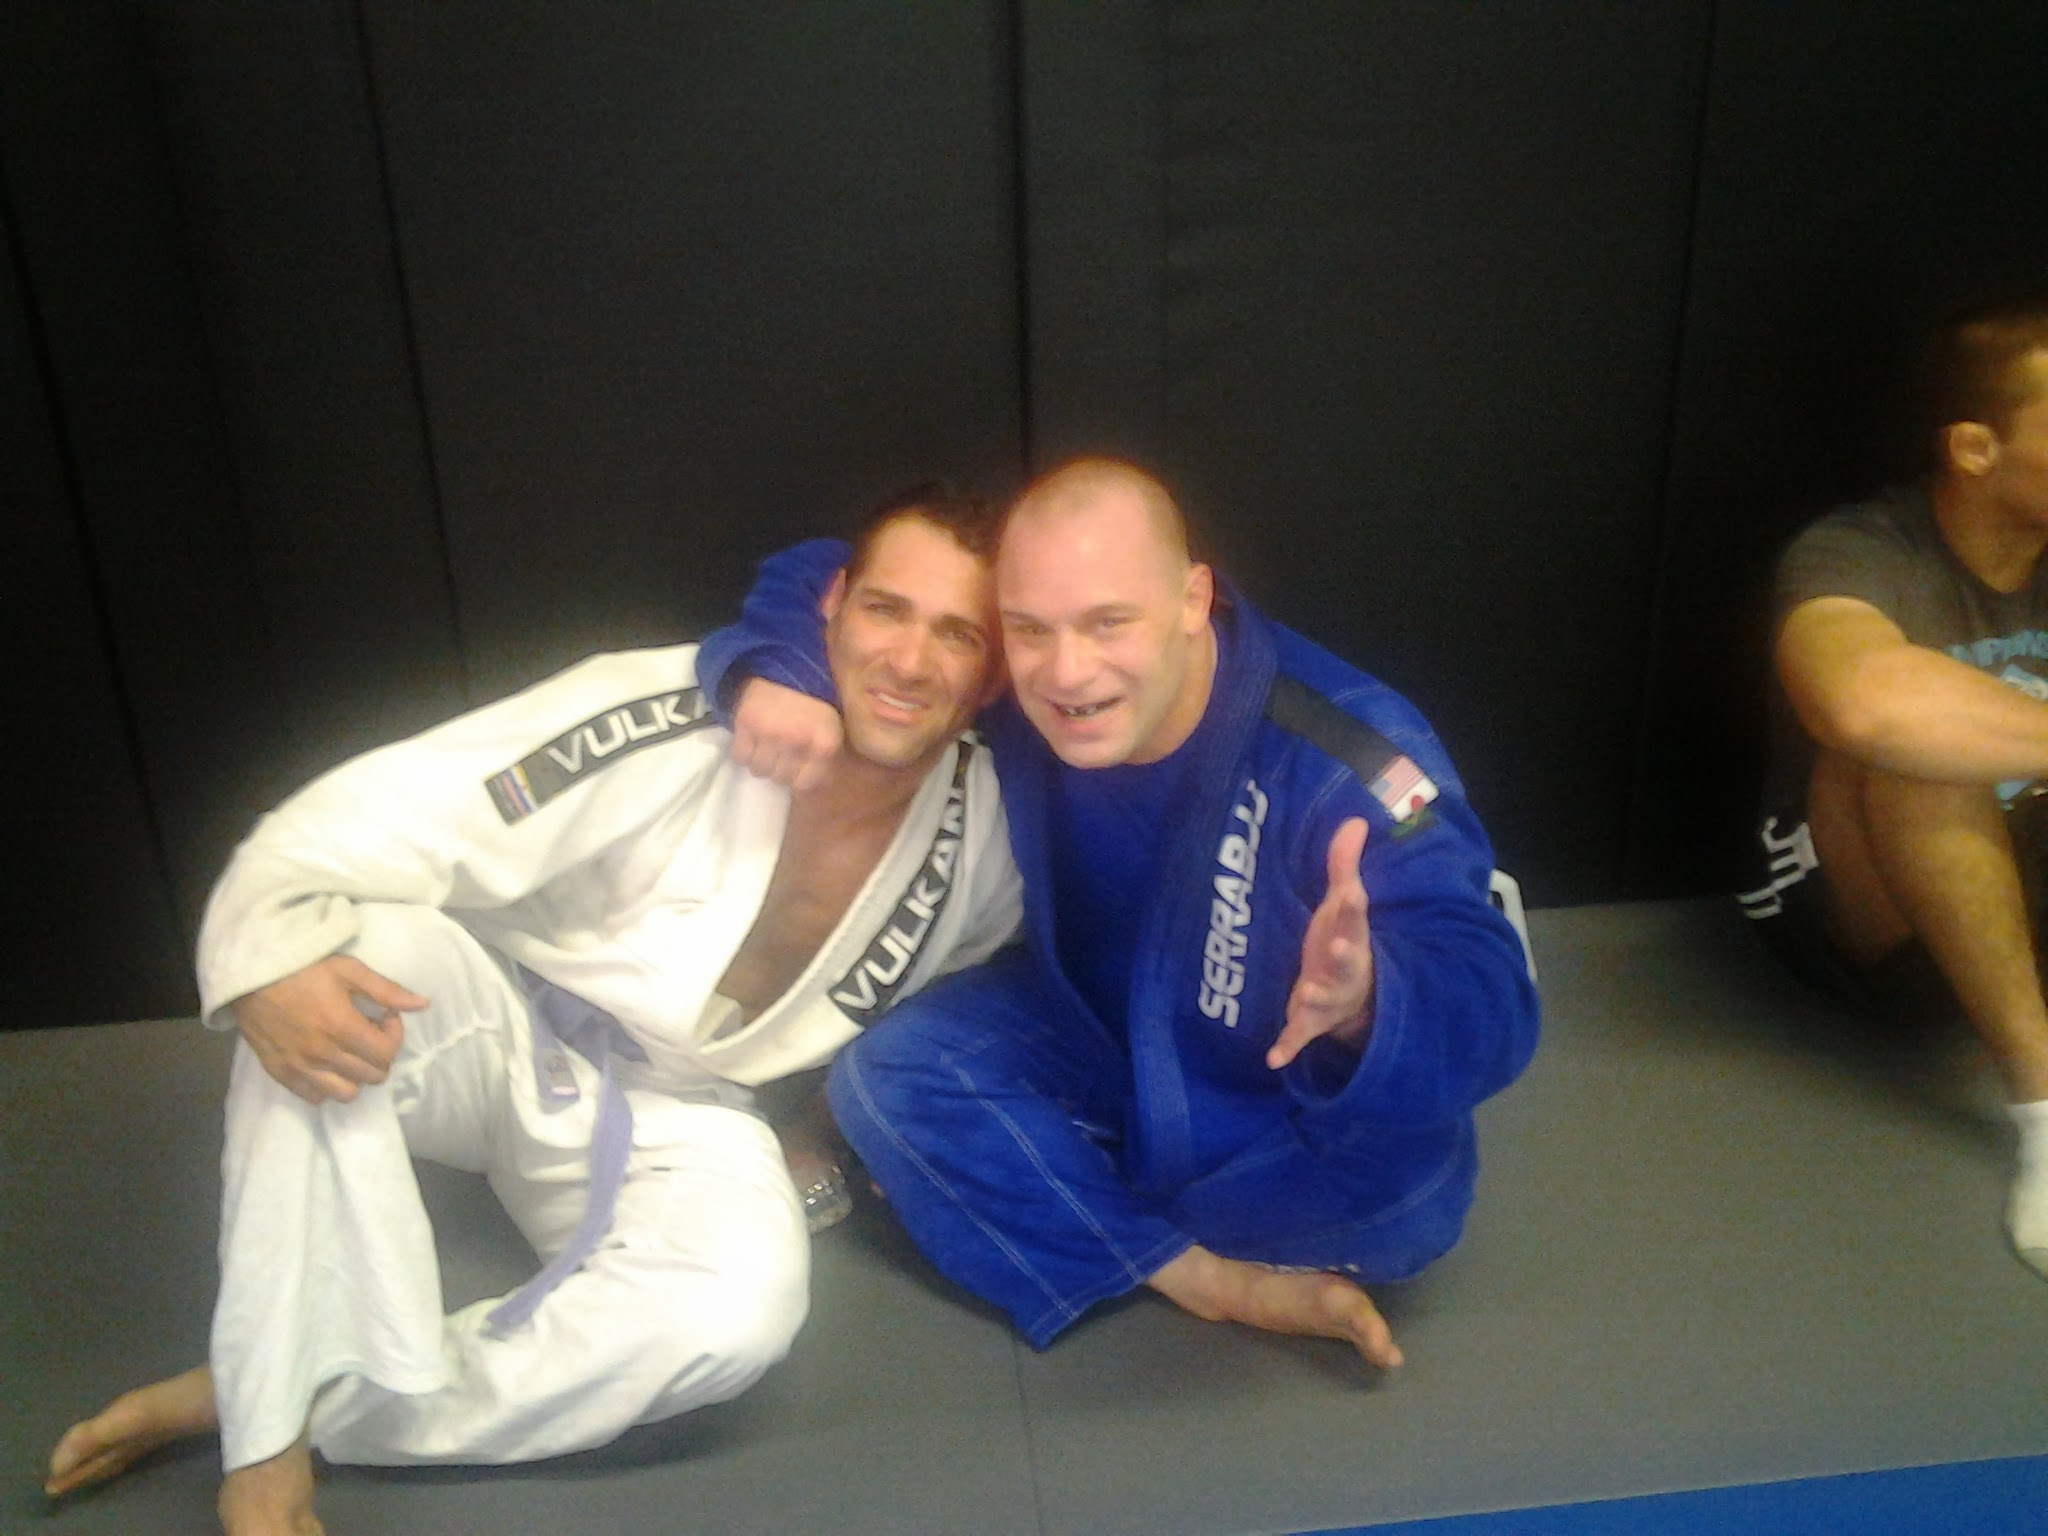 Israel Joffe and Matt Serra